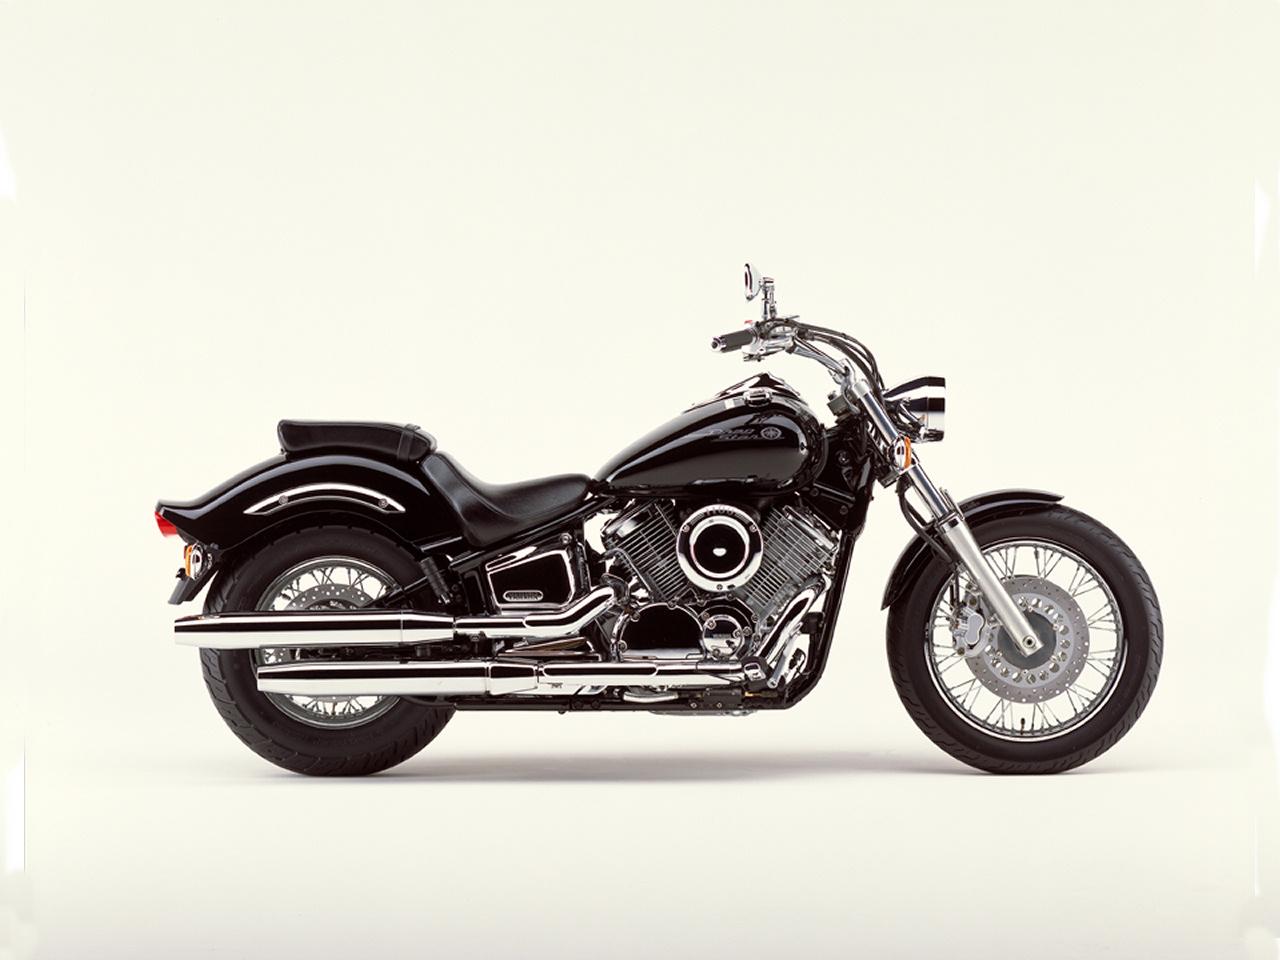 xvs 1100 dragstar customs galeries photos motoplanete. Black Bedroom Furniture Sets. Home Design Ideas